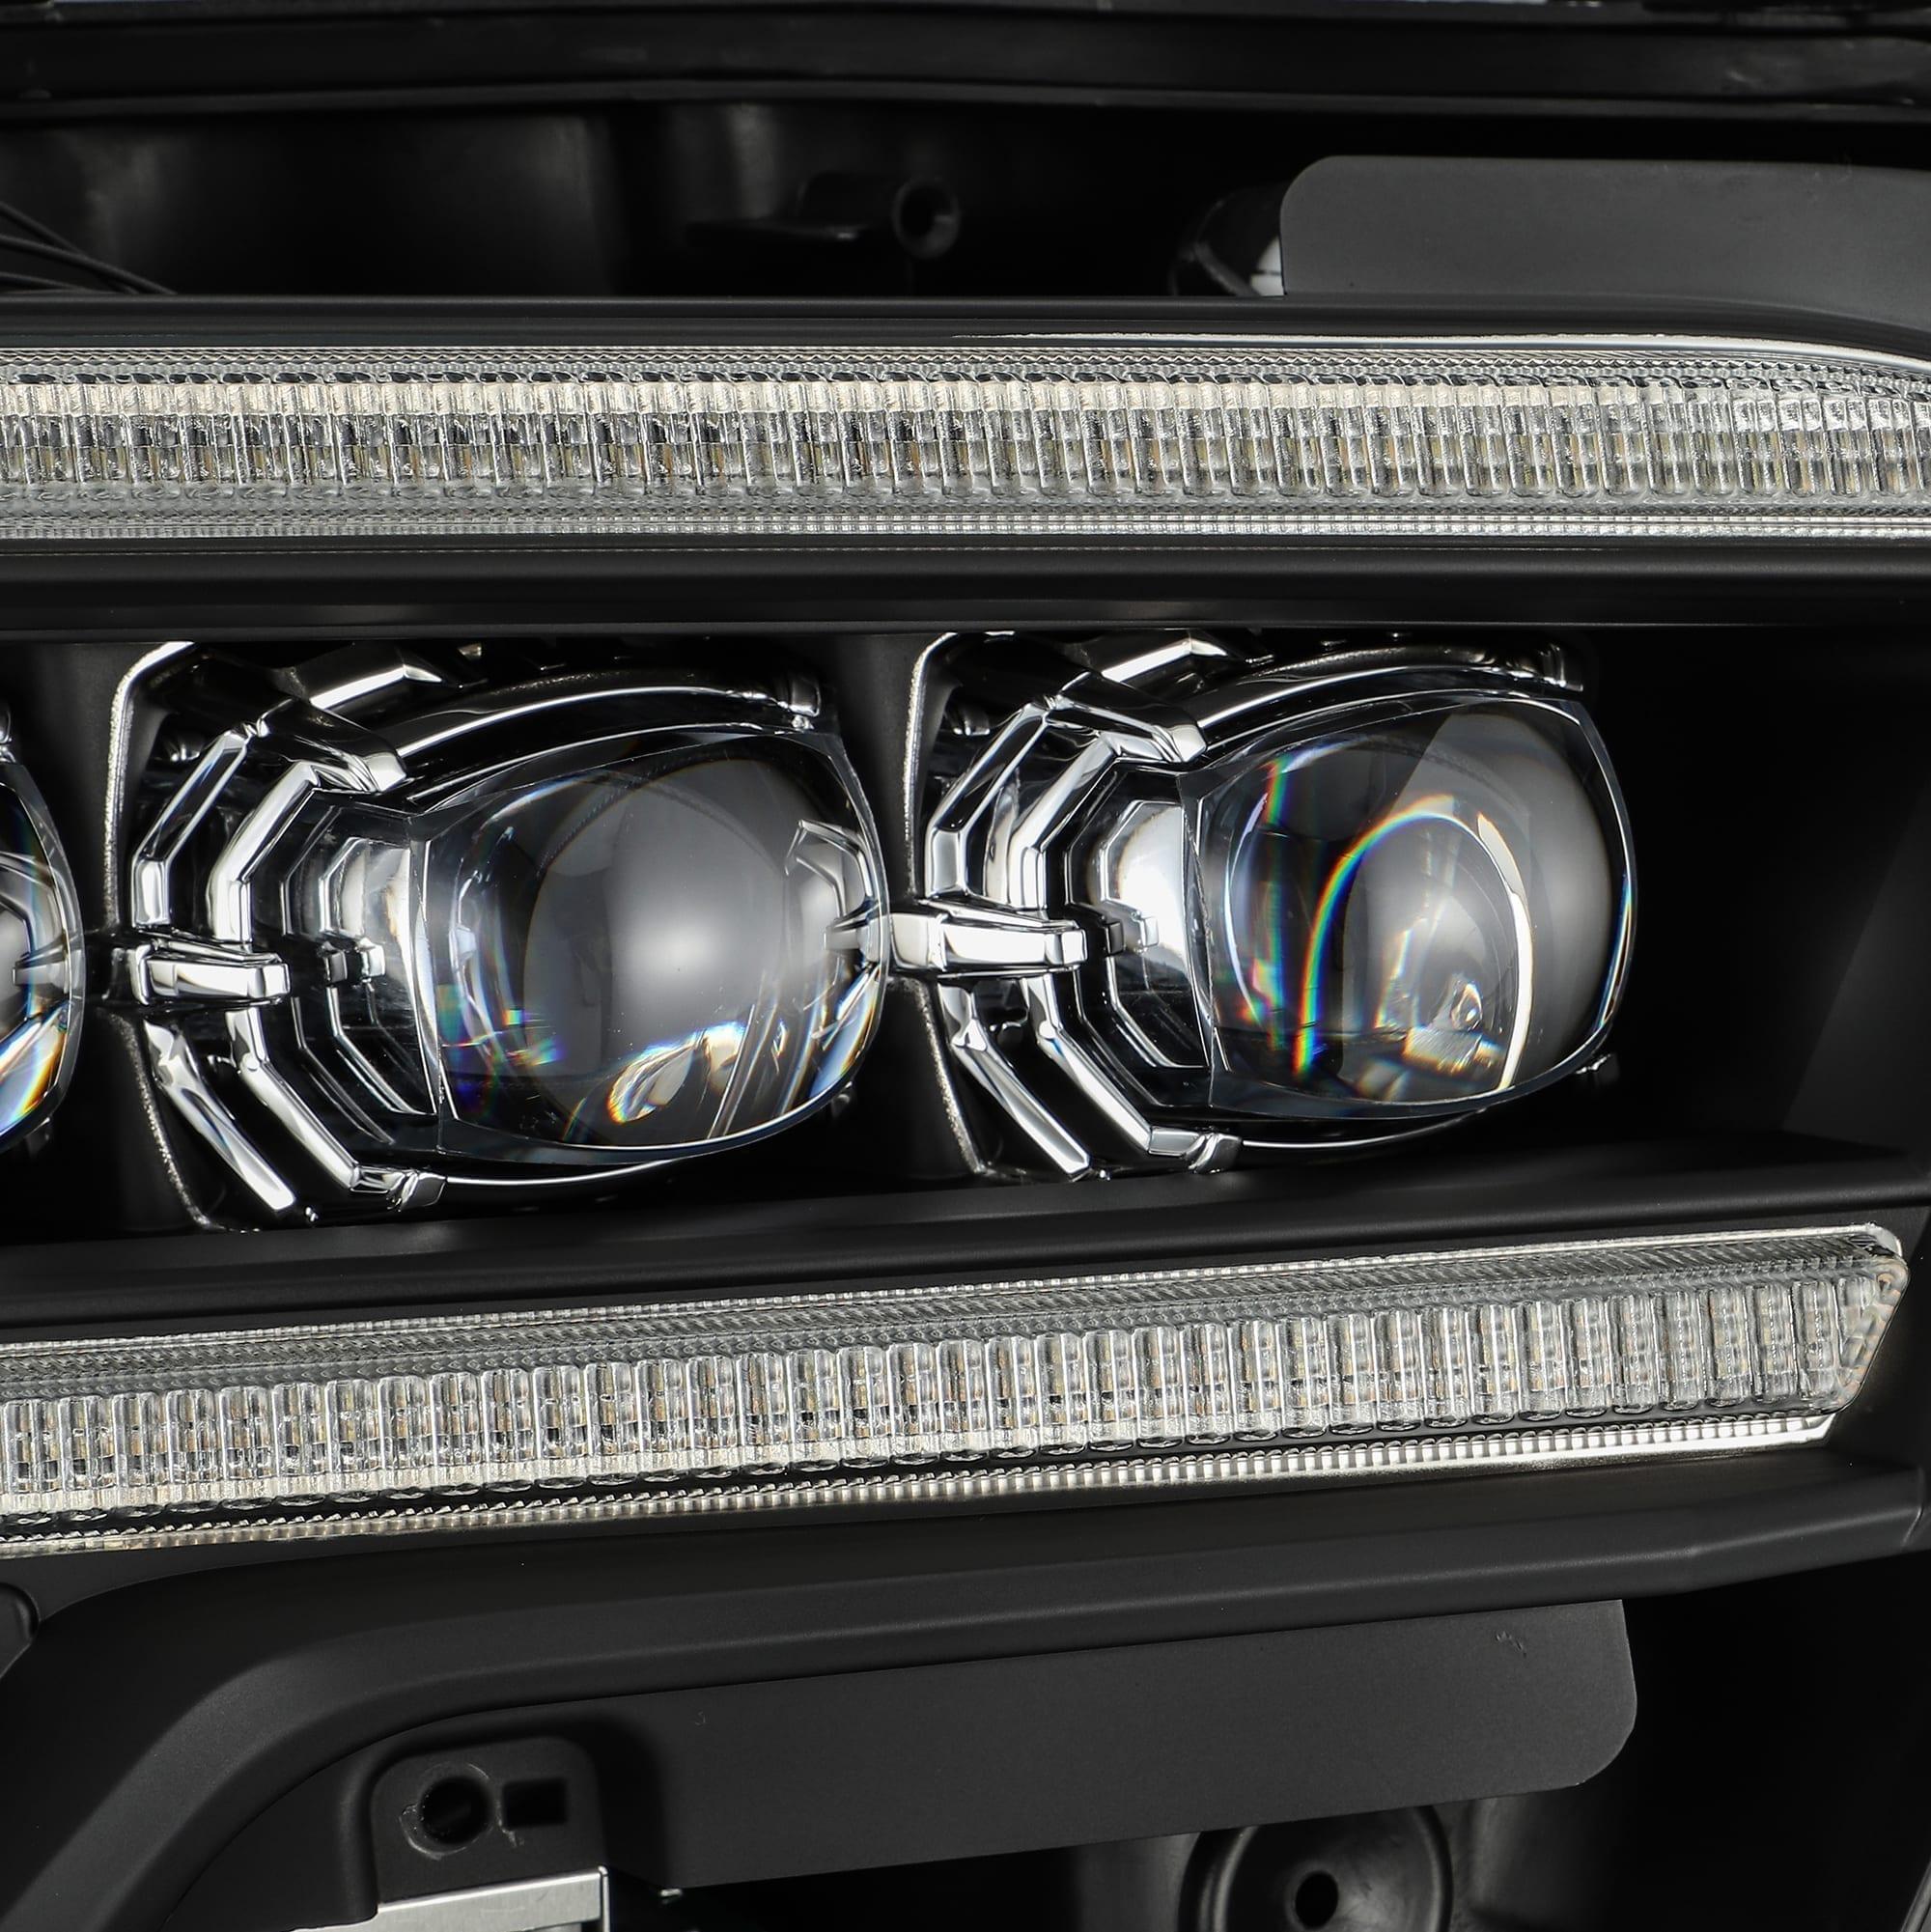 2016 2017 2018 2019 2020 Toyota Tacoma NOVA-Series Full LED Projector Headlights Black